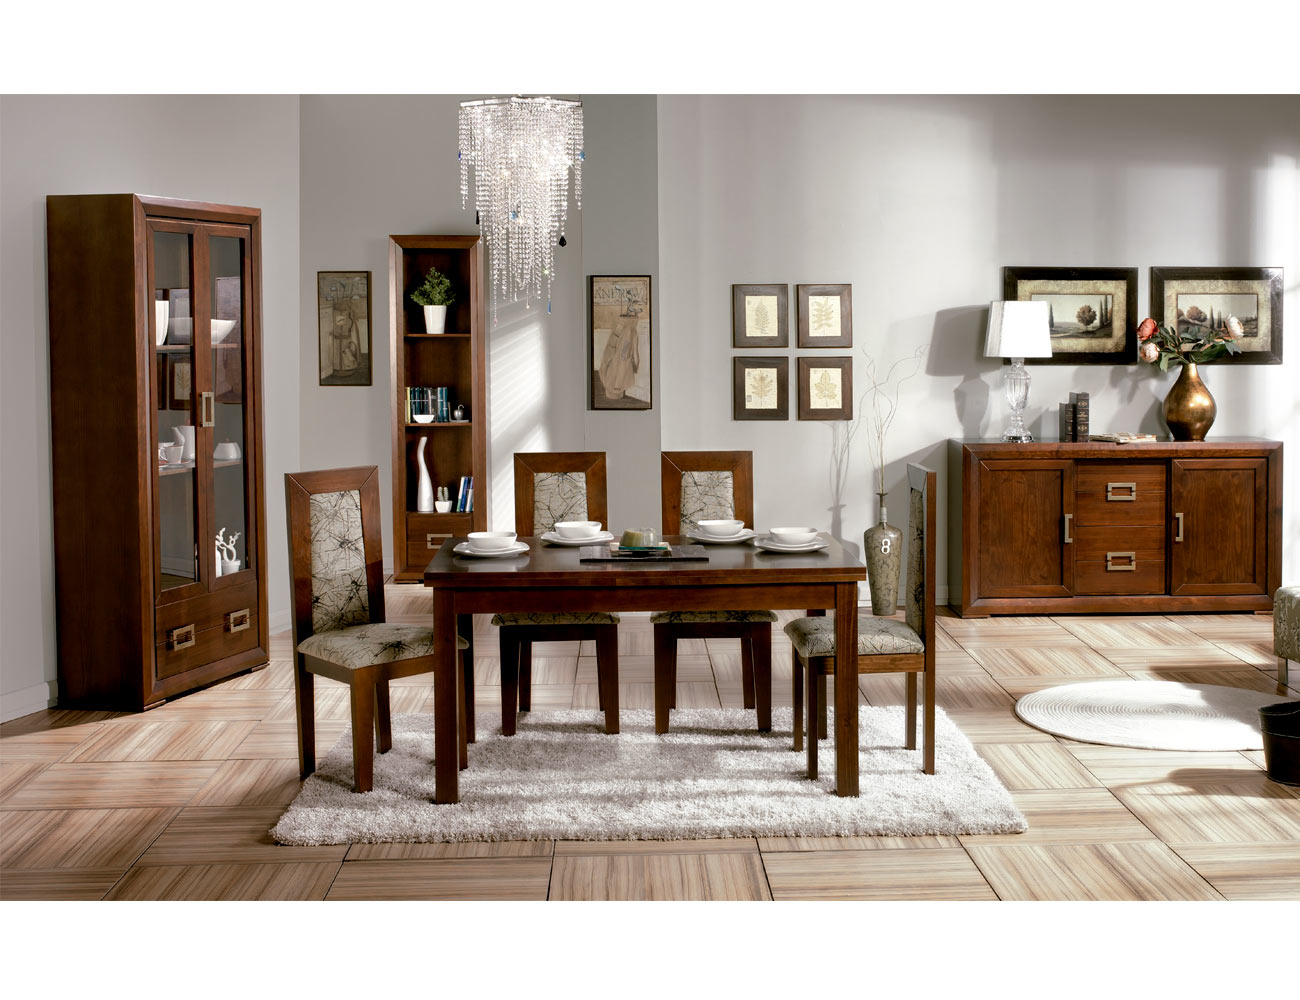 Composicion34 mueble salon comedor madera6